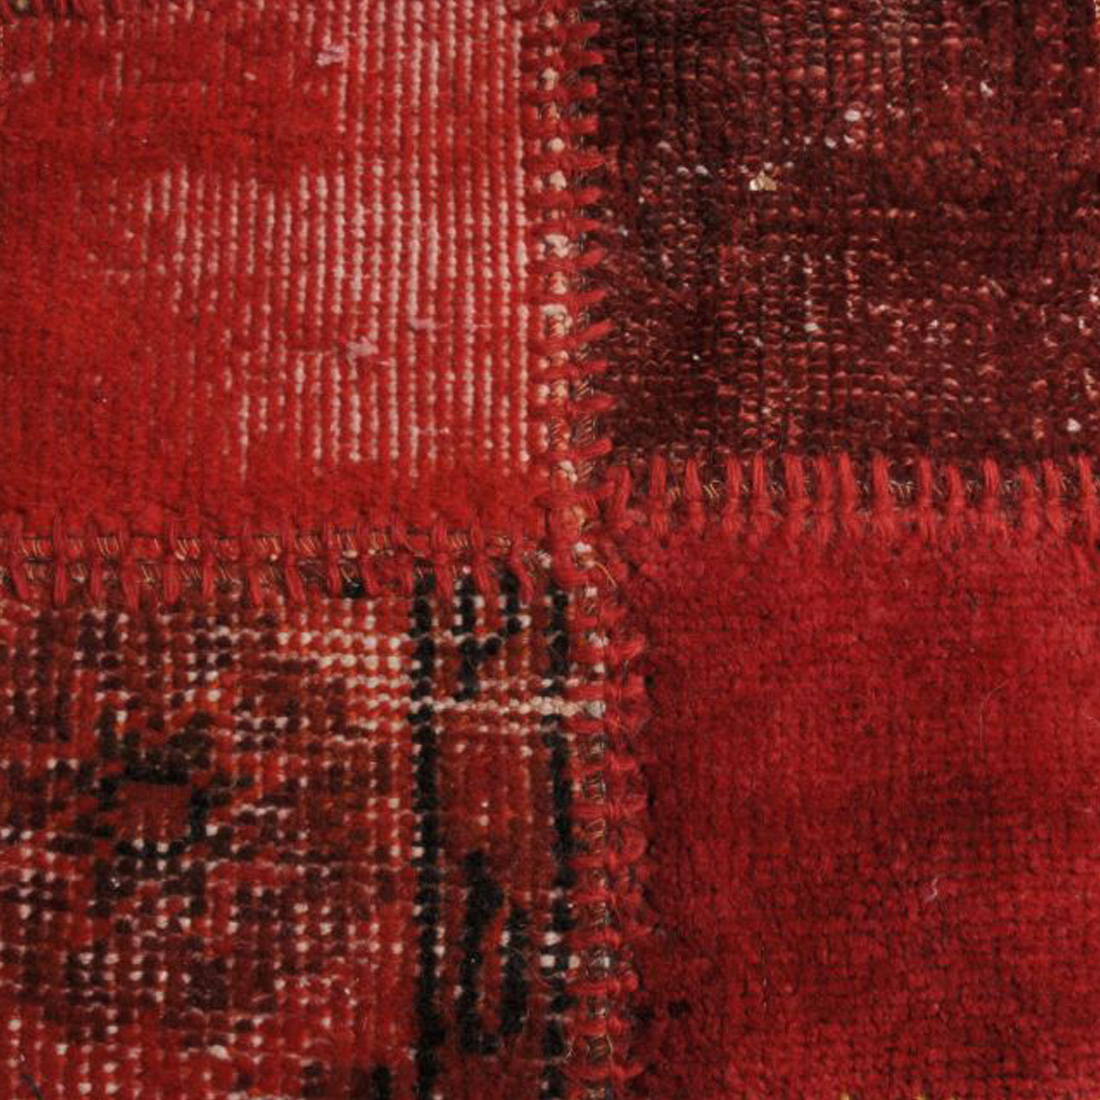 Vintage Vloerkleed Antique Handgeknoopt Red | 170 x 230 cm